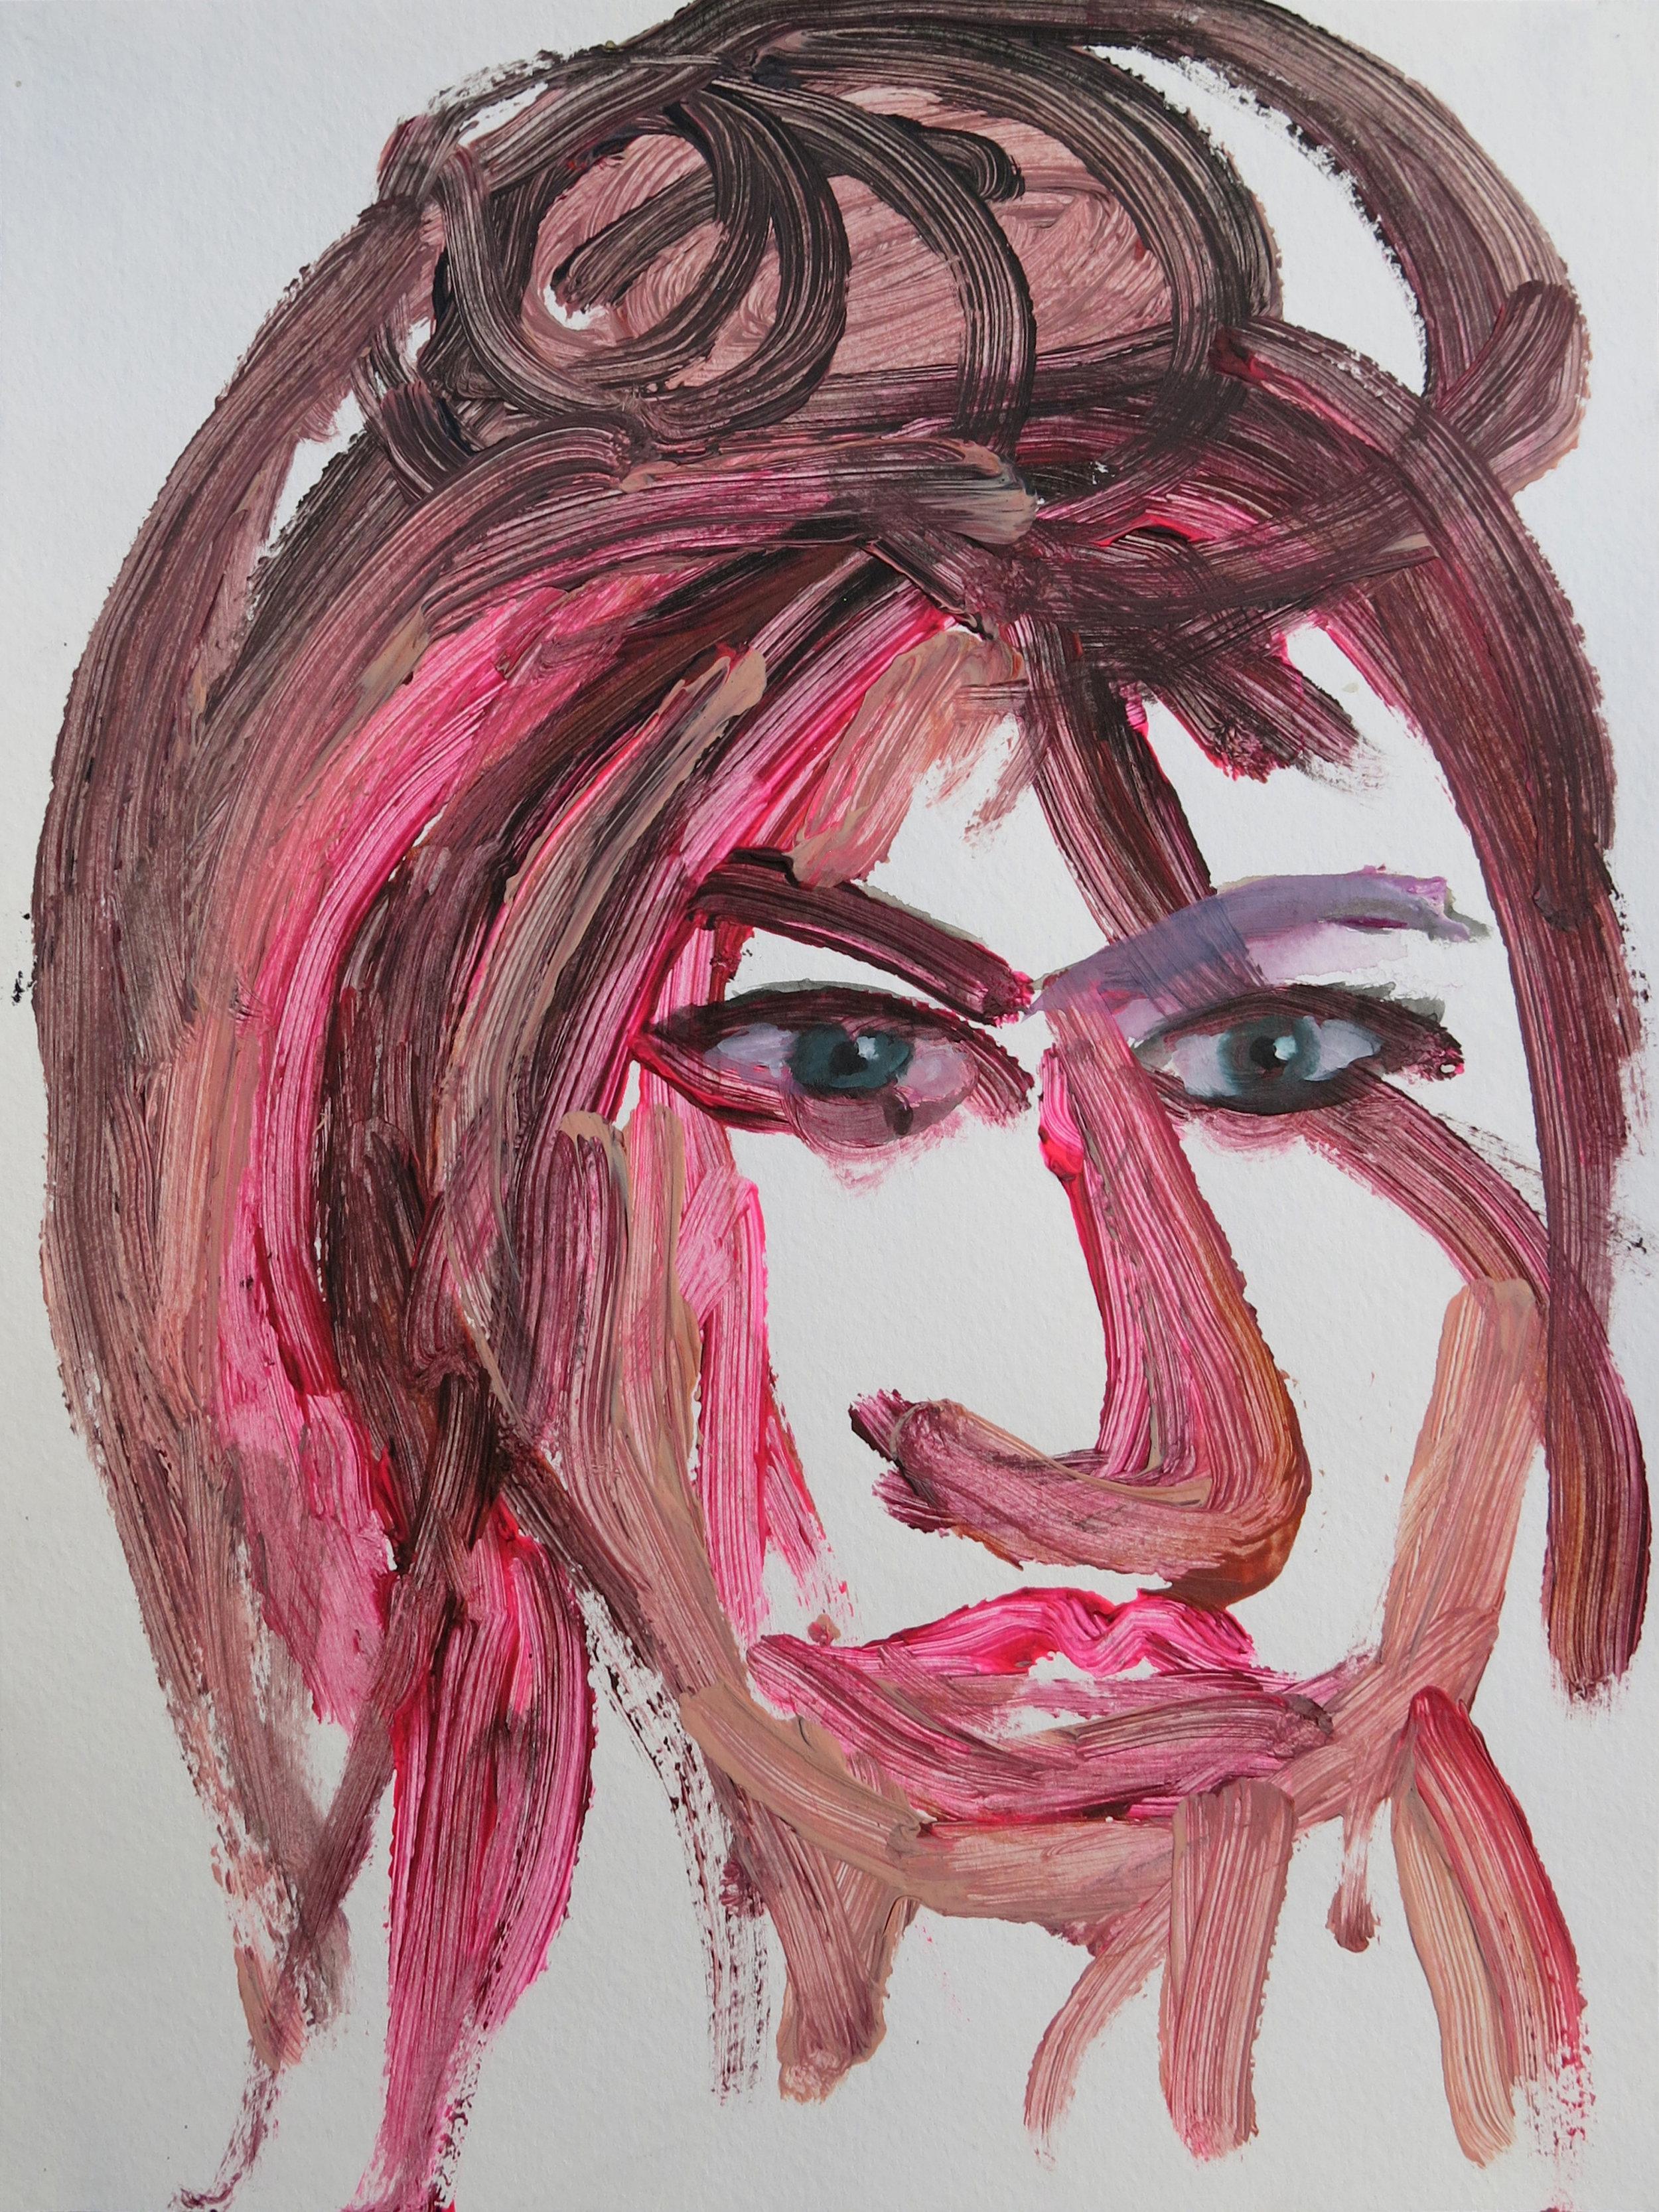 Barbra Streisand Portrait #215